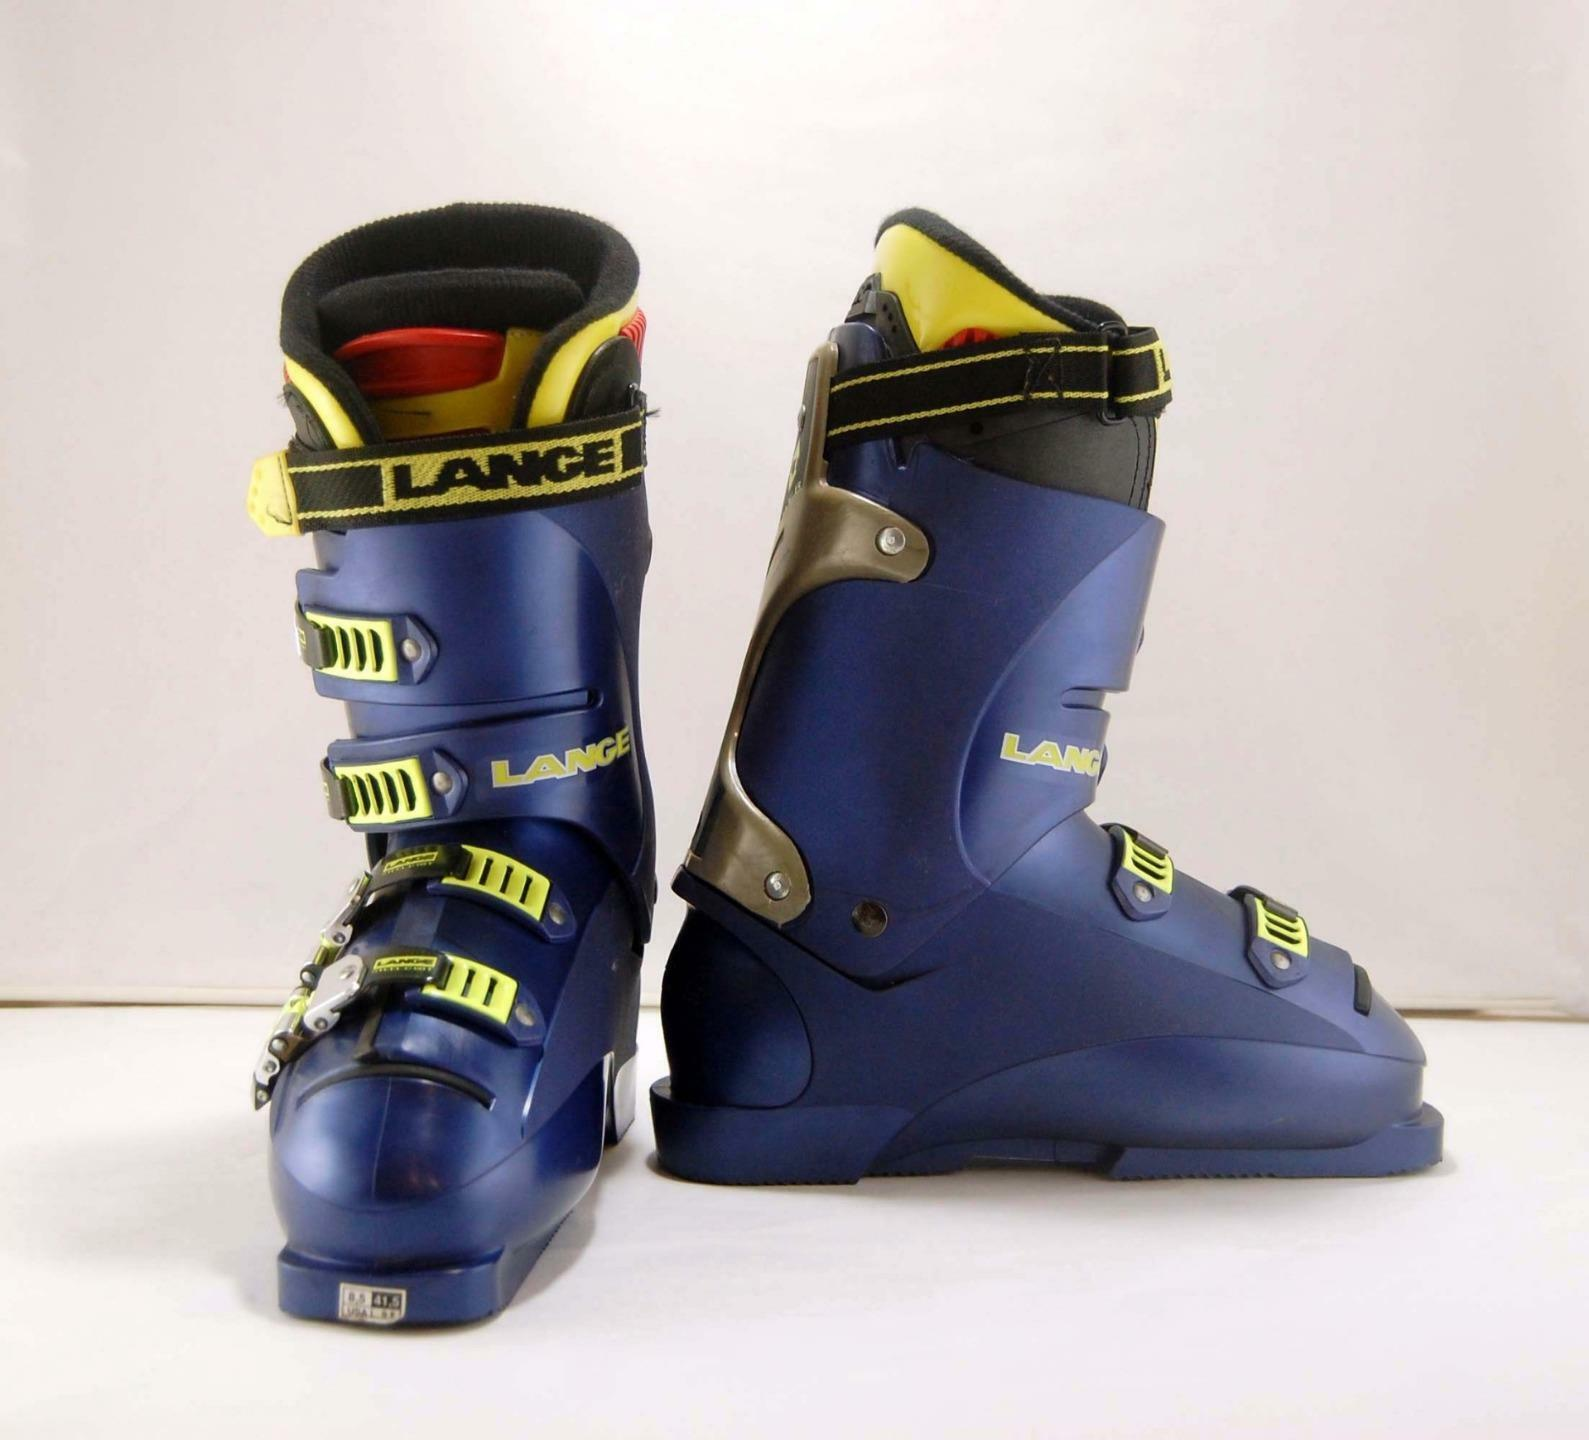 Mens Lange X Zero 9 Downhill Ski Boots bluee Yellow  305 mm Size 8.5 41.5  presenting all the latest high street fashion